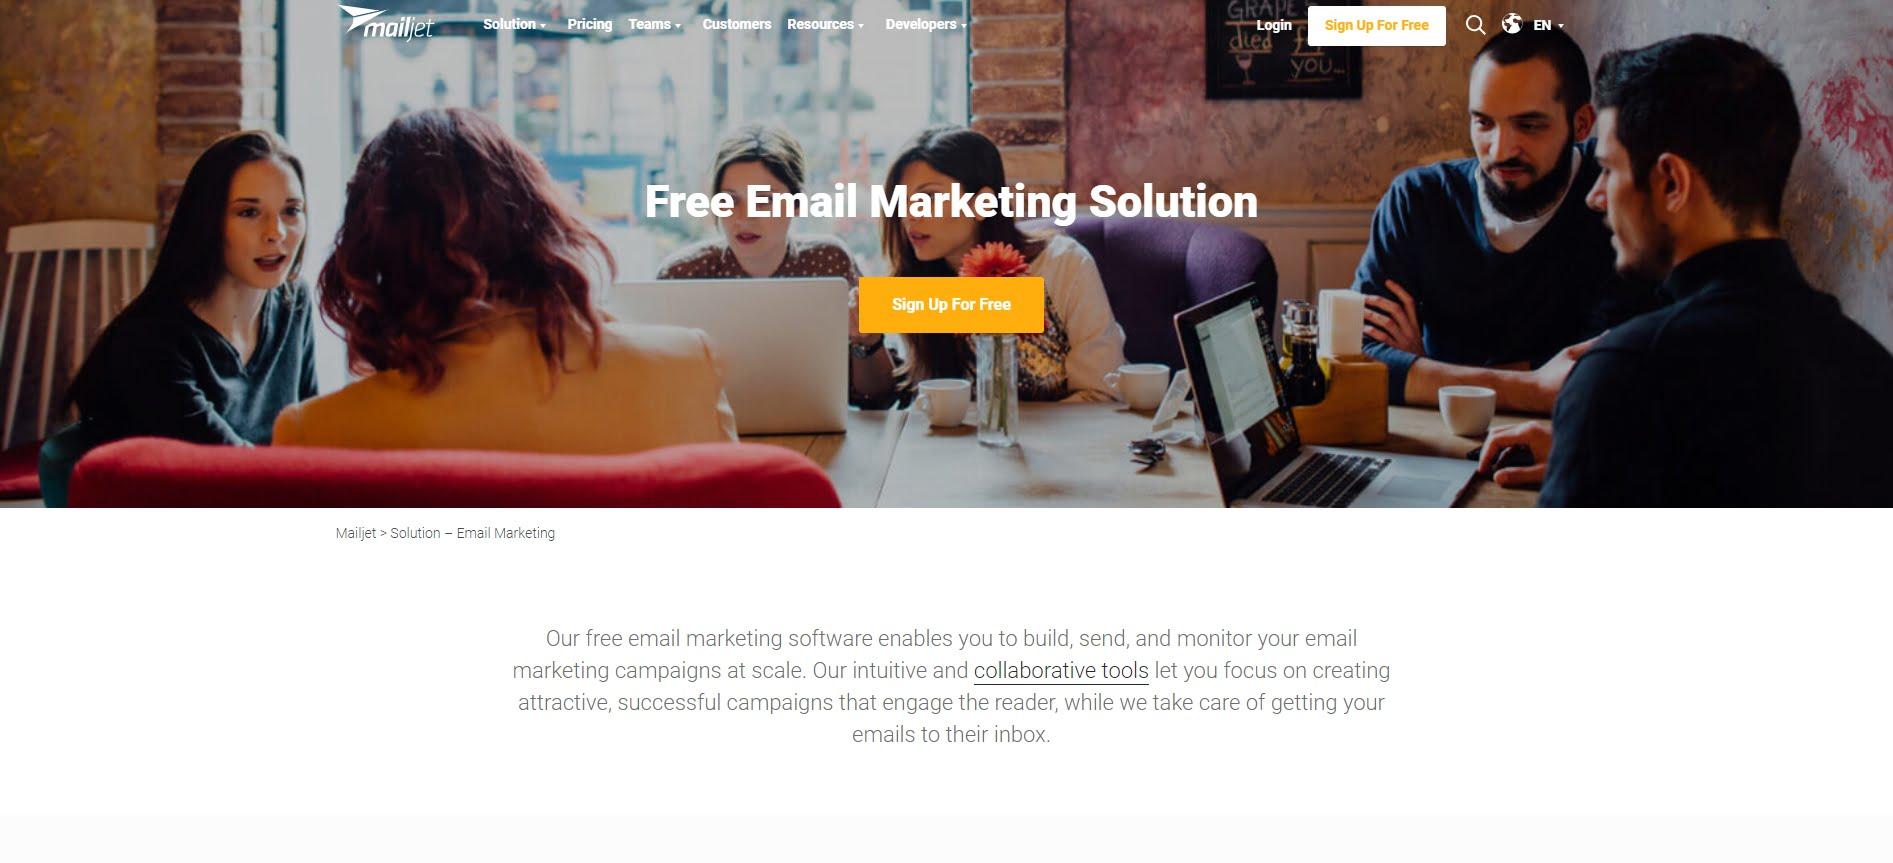 Mailjet homepage